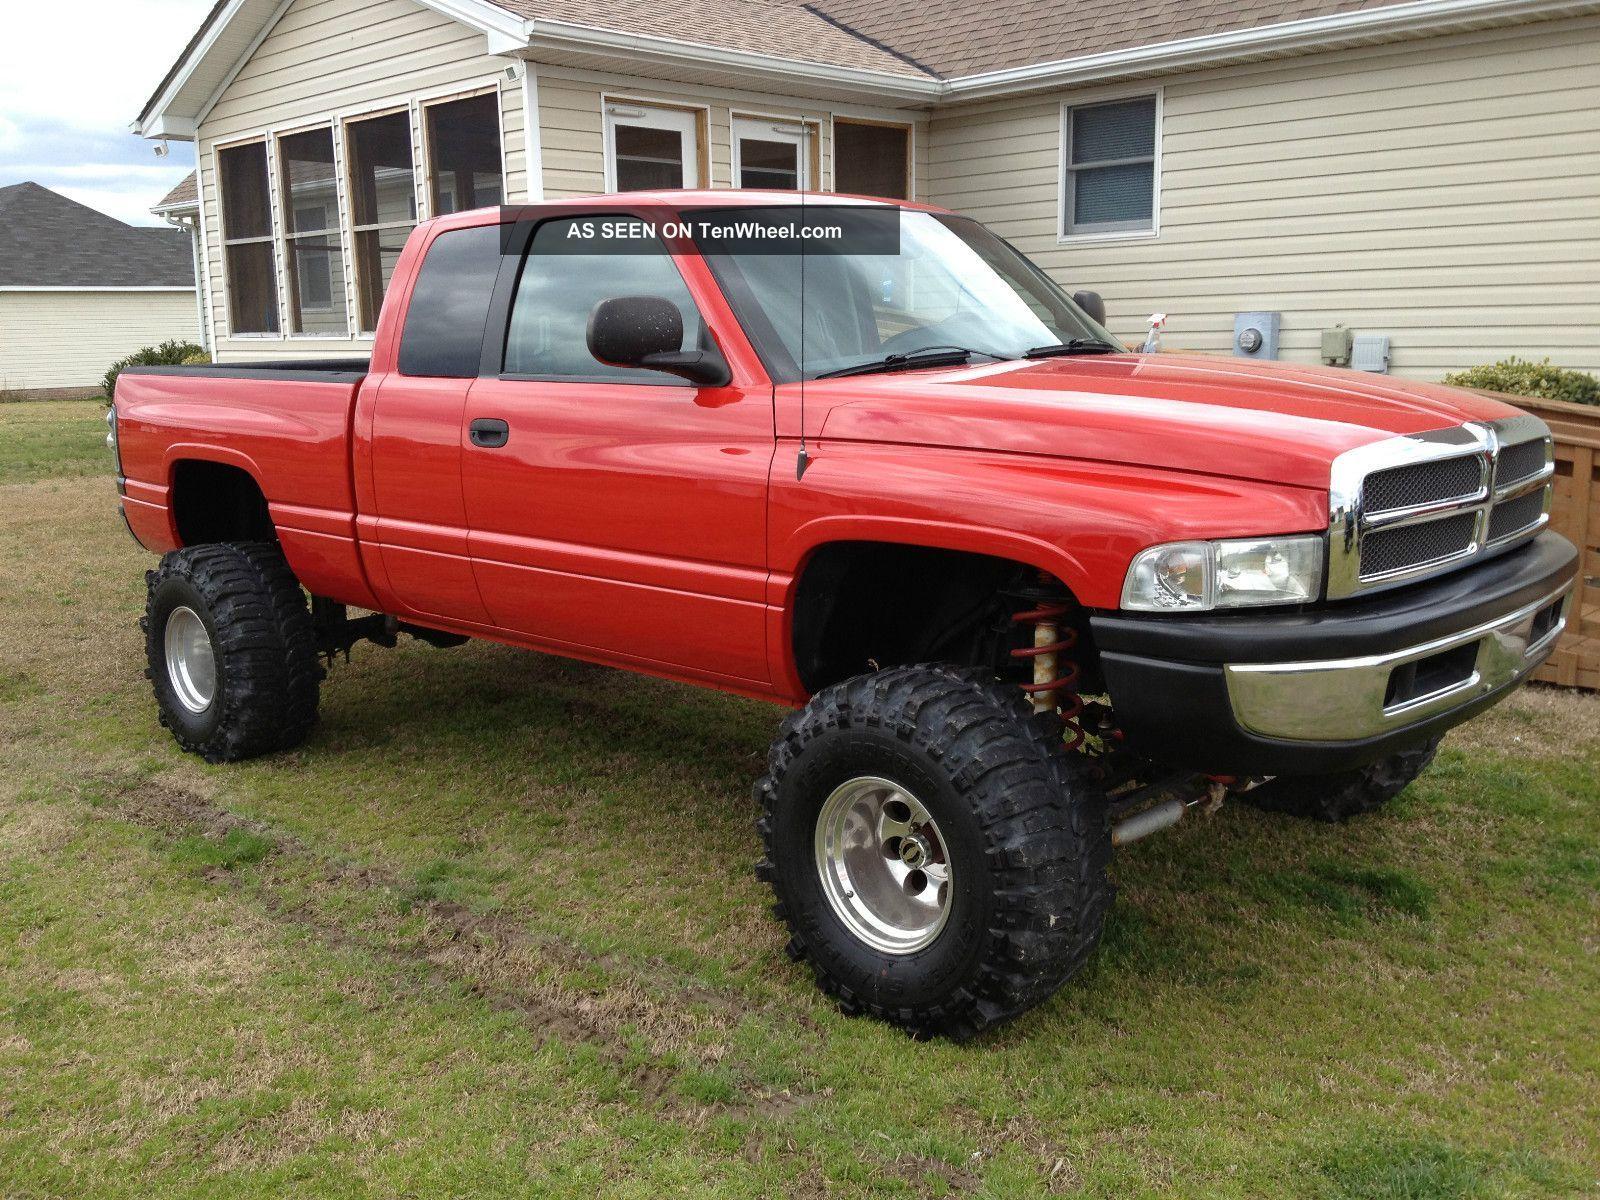 1998 Dodge Ram 1500 Dodge Trucks Ram Dodge Diesel Cummins Trucks